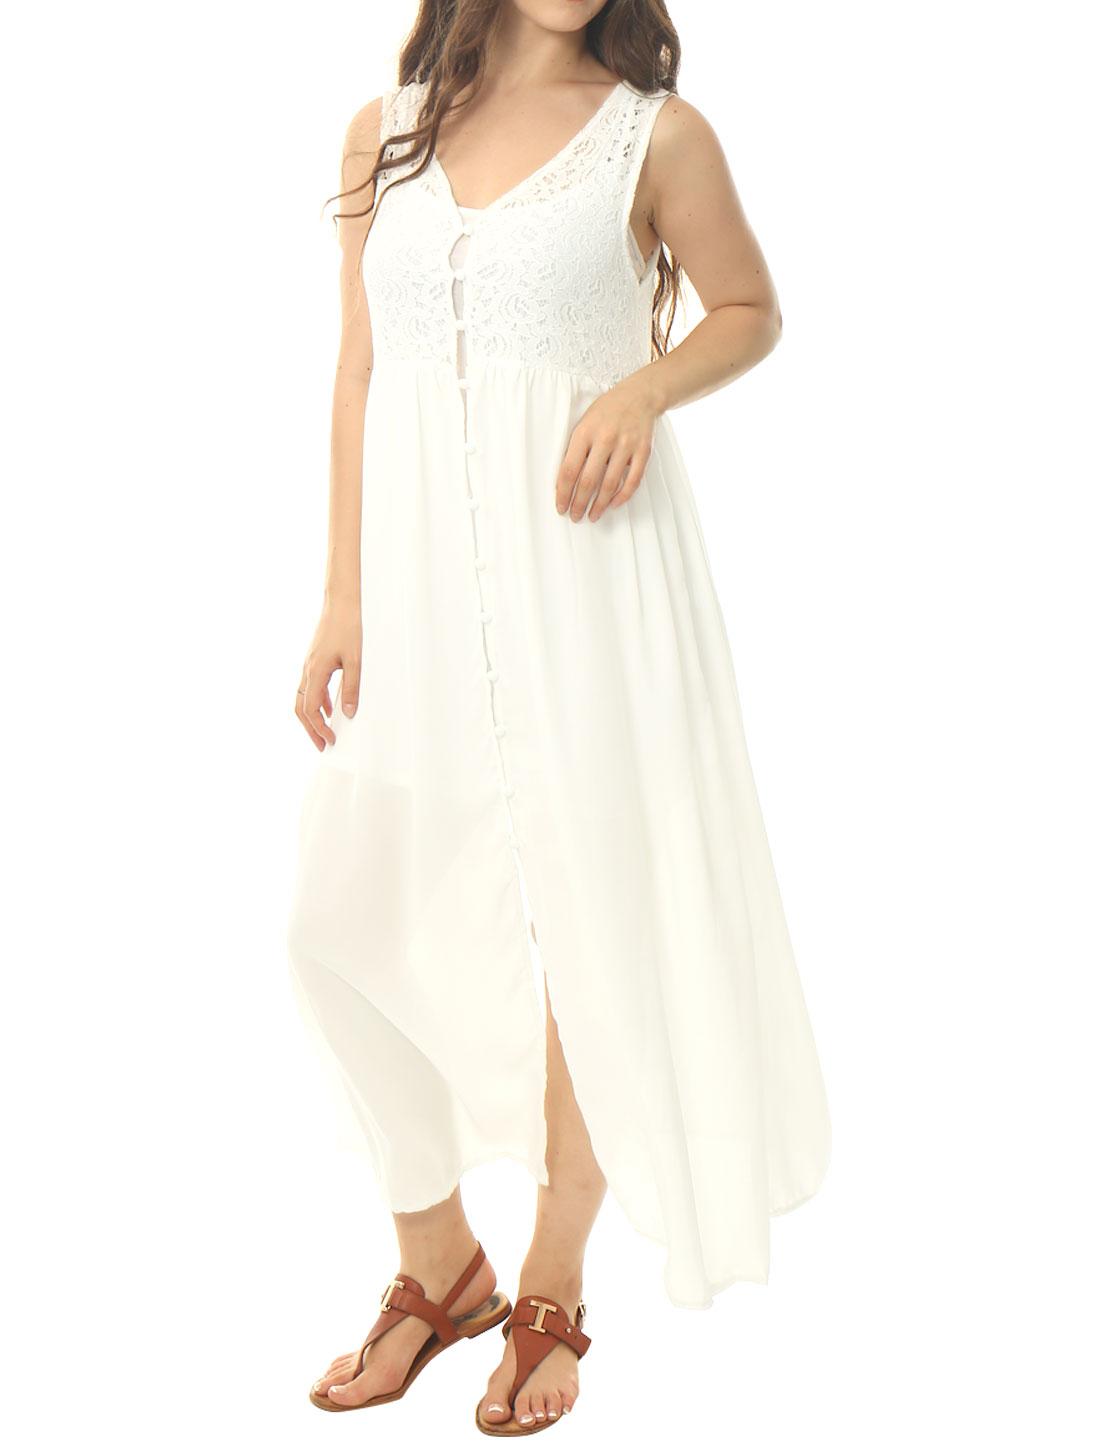 Women Lace Panel Semi Sheer Long Length Sleeveless Cardigan White S